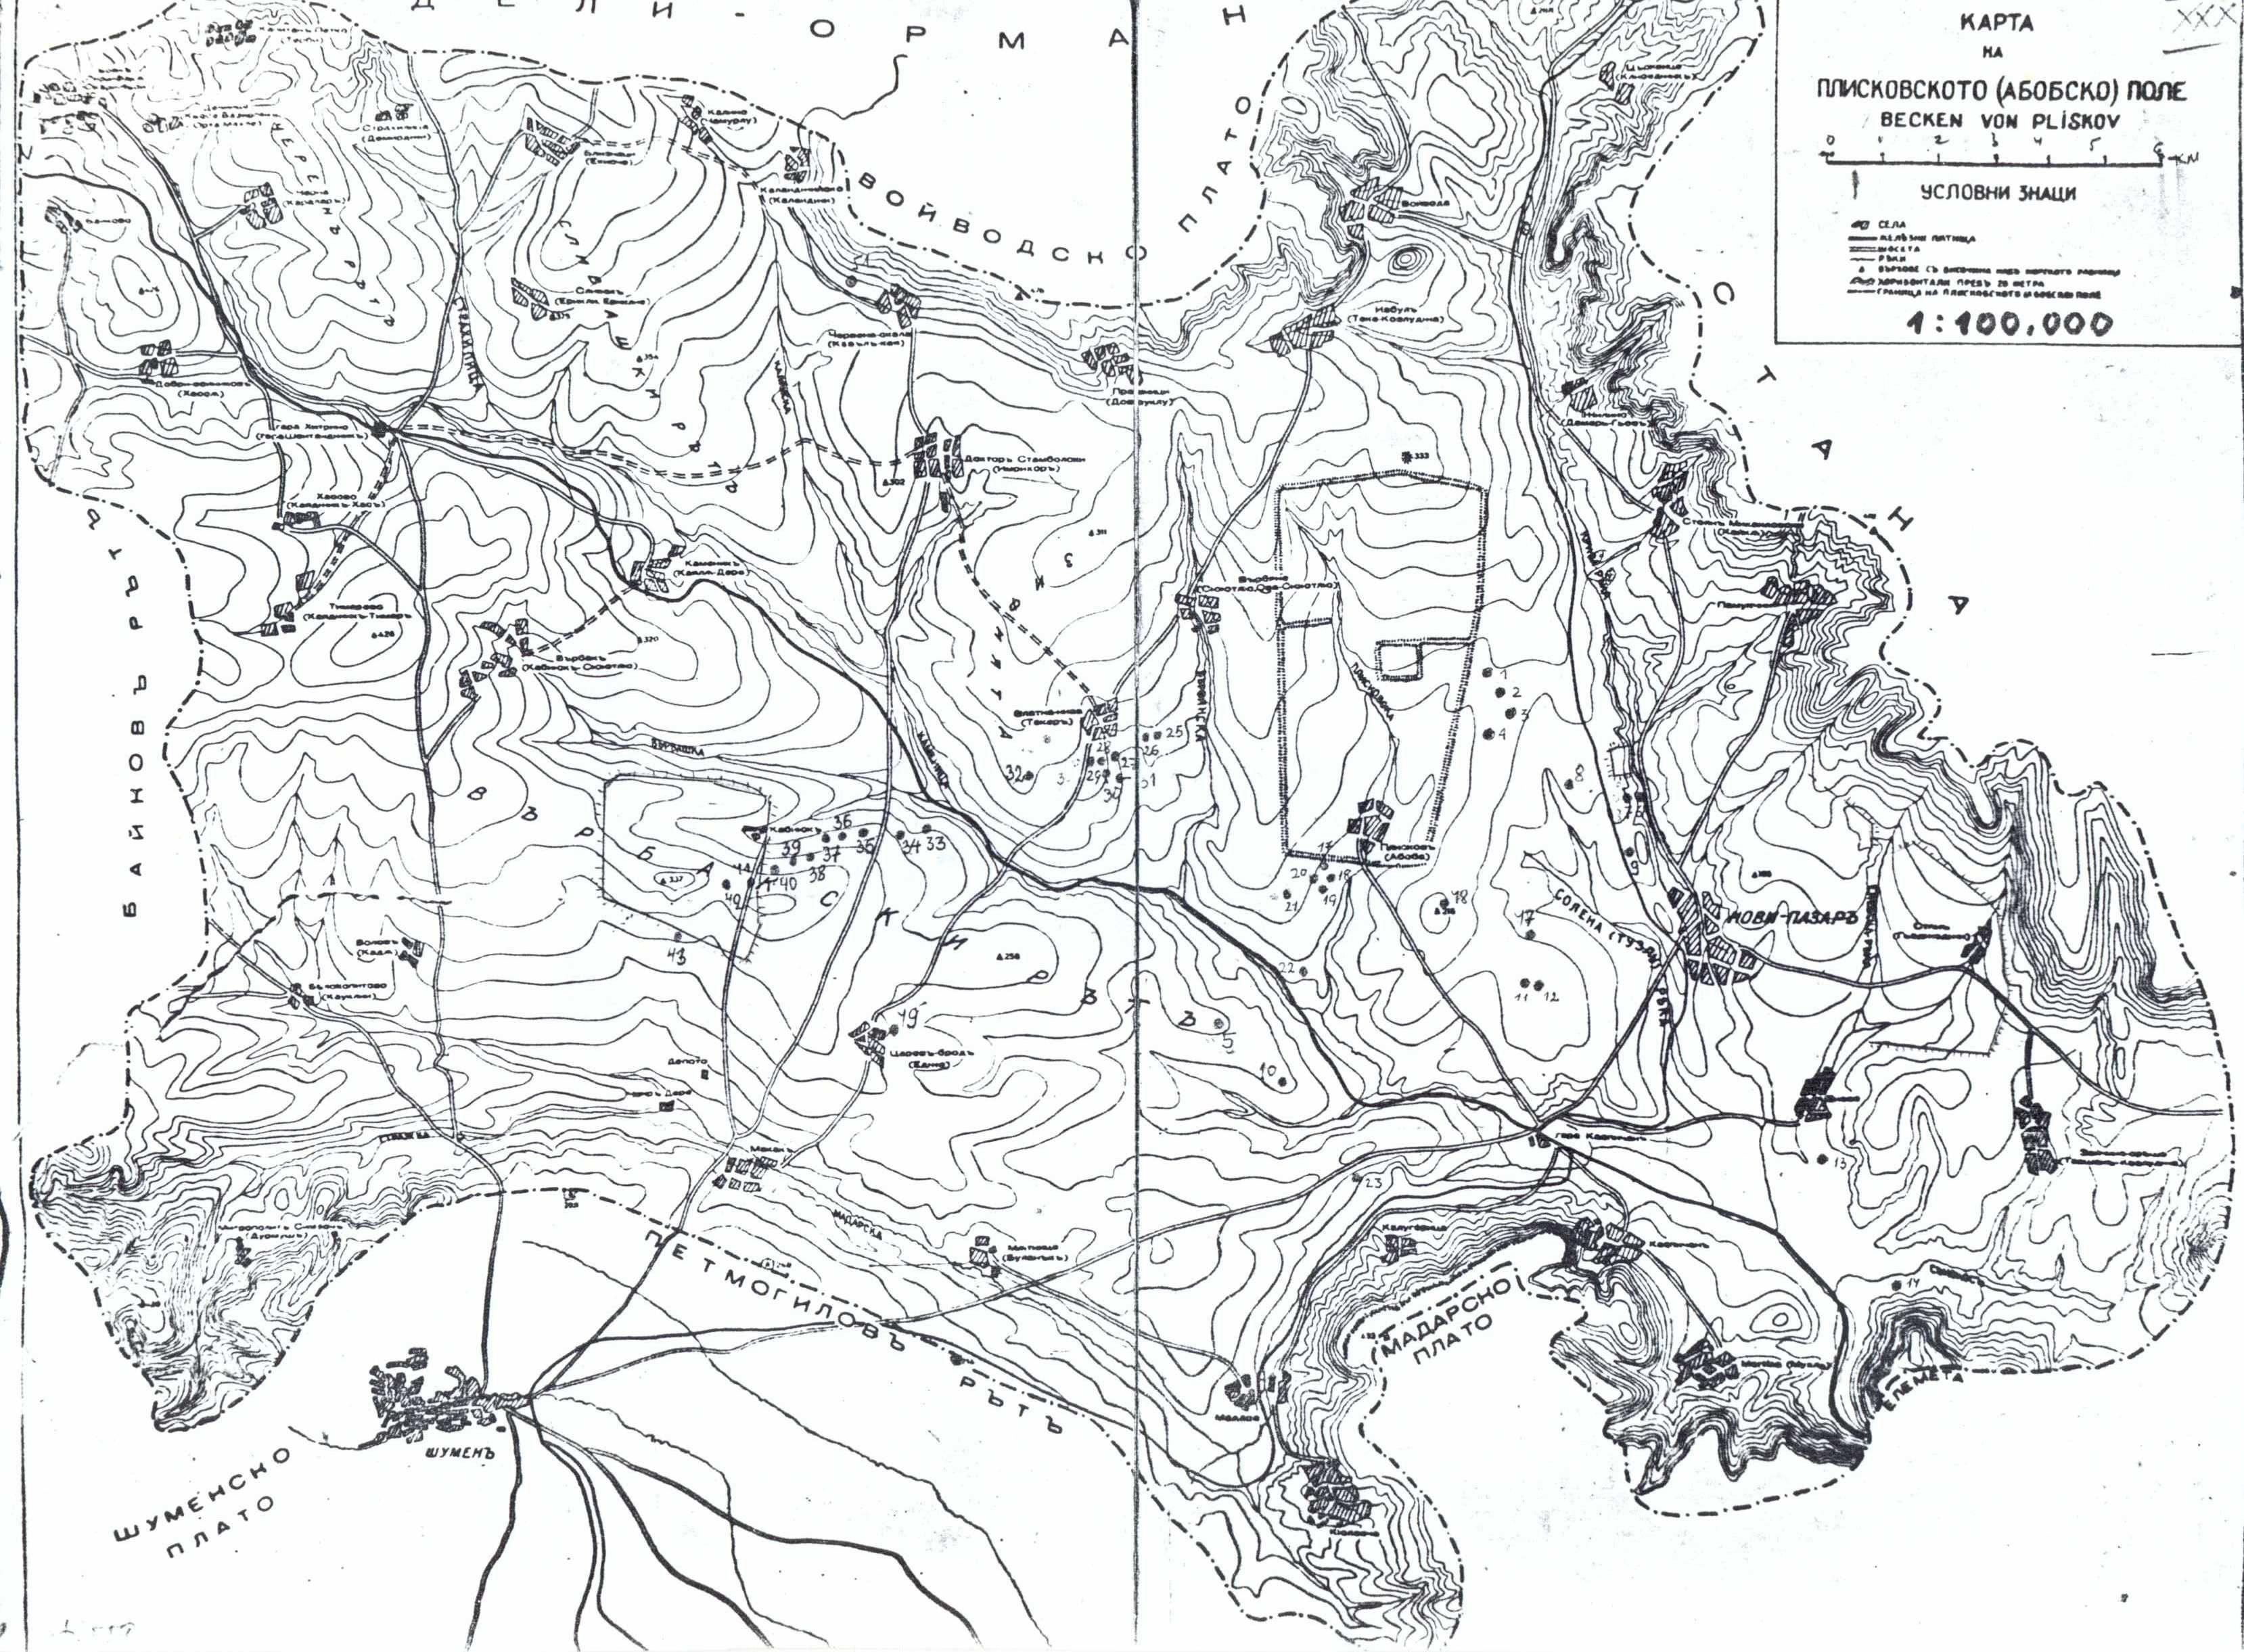 Proekt Karare Nacionalen Istoriko Arheologicheski Rezervat Pliska